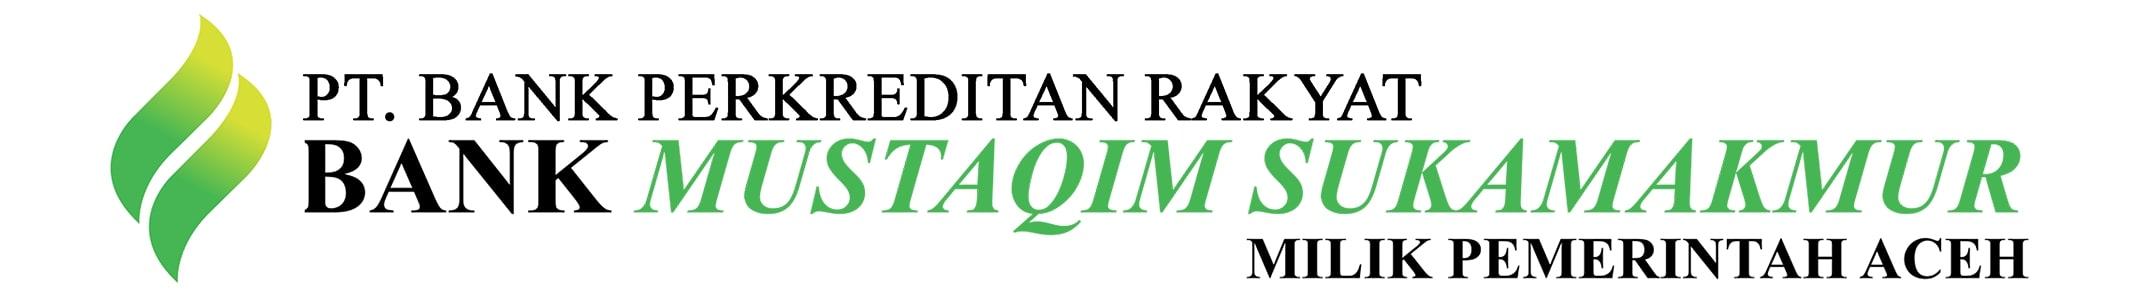 logo-BPR